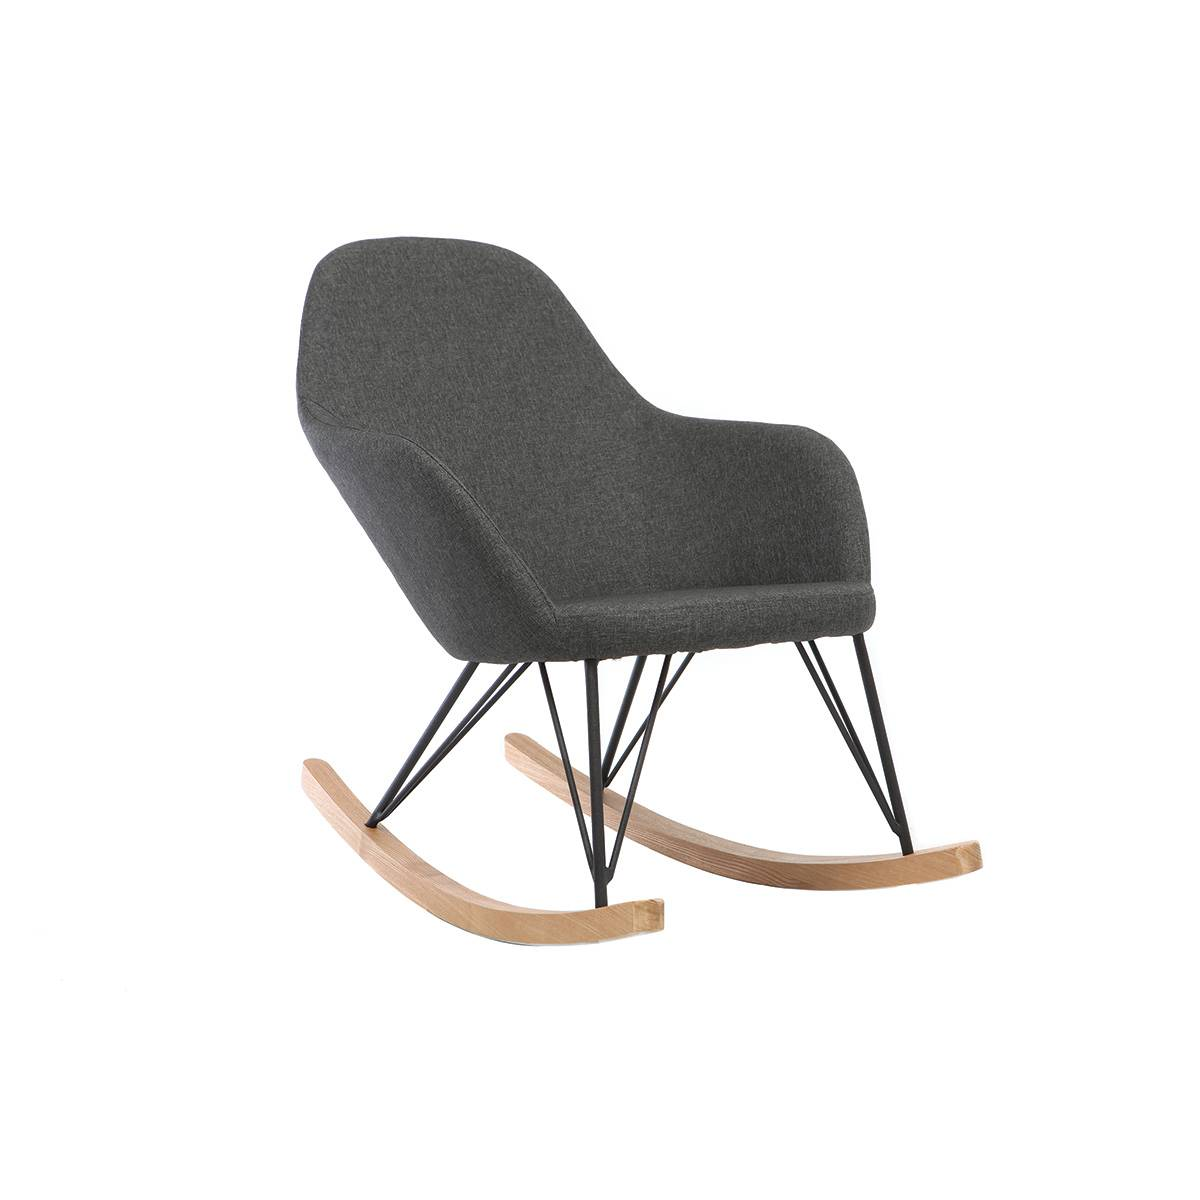 Miliboo Rocking chair tissu gris anthracite pieds métal et frêne JHENE